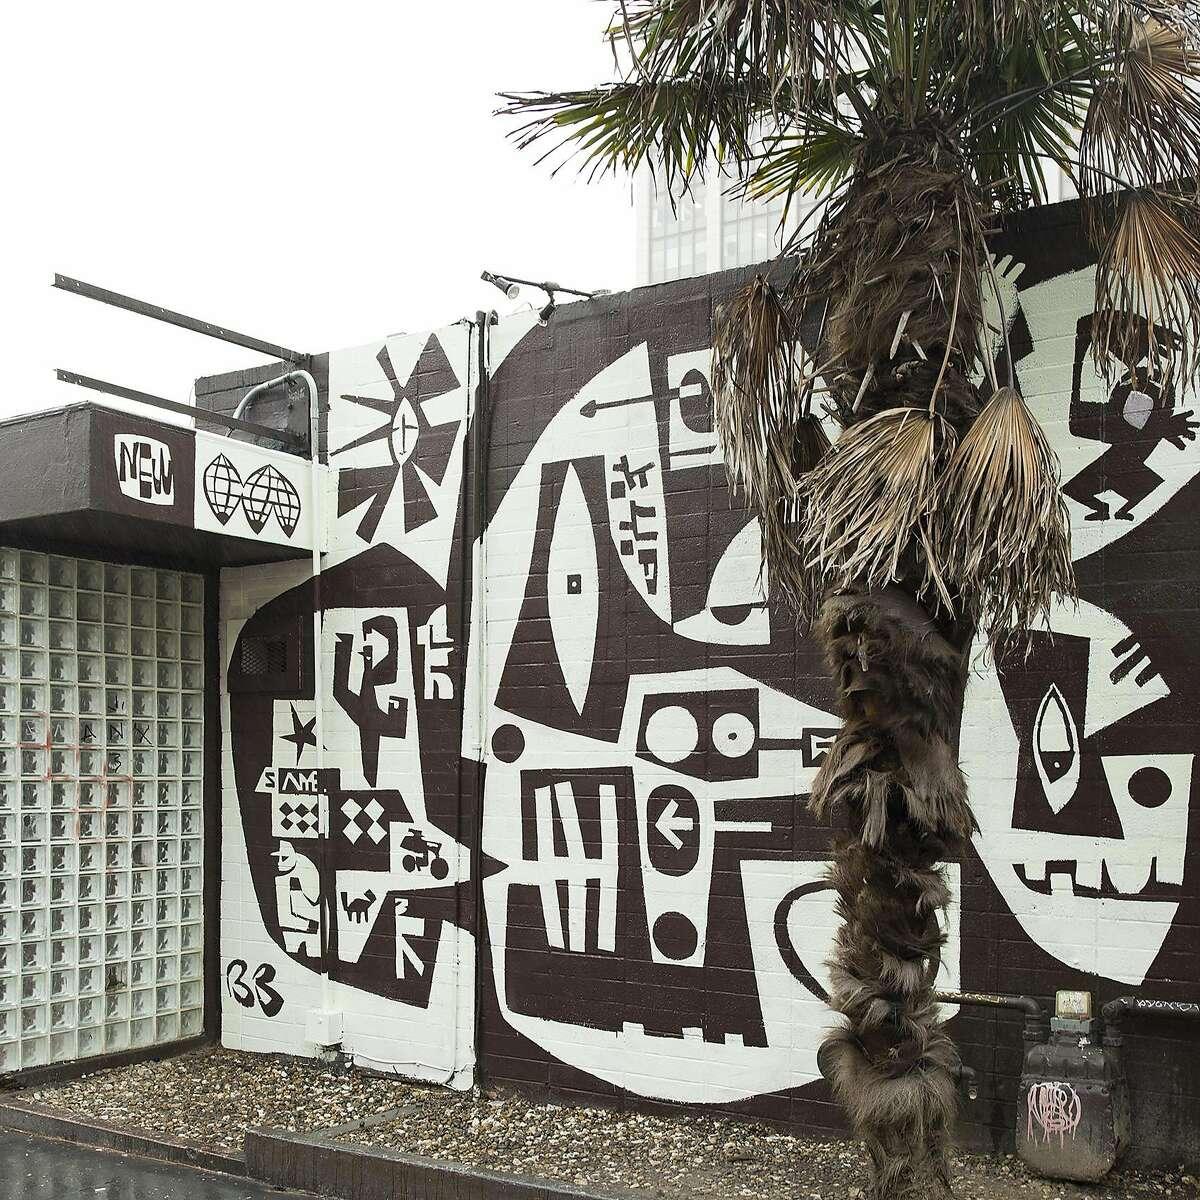 Murals featured in